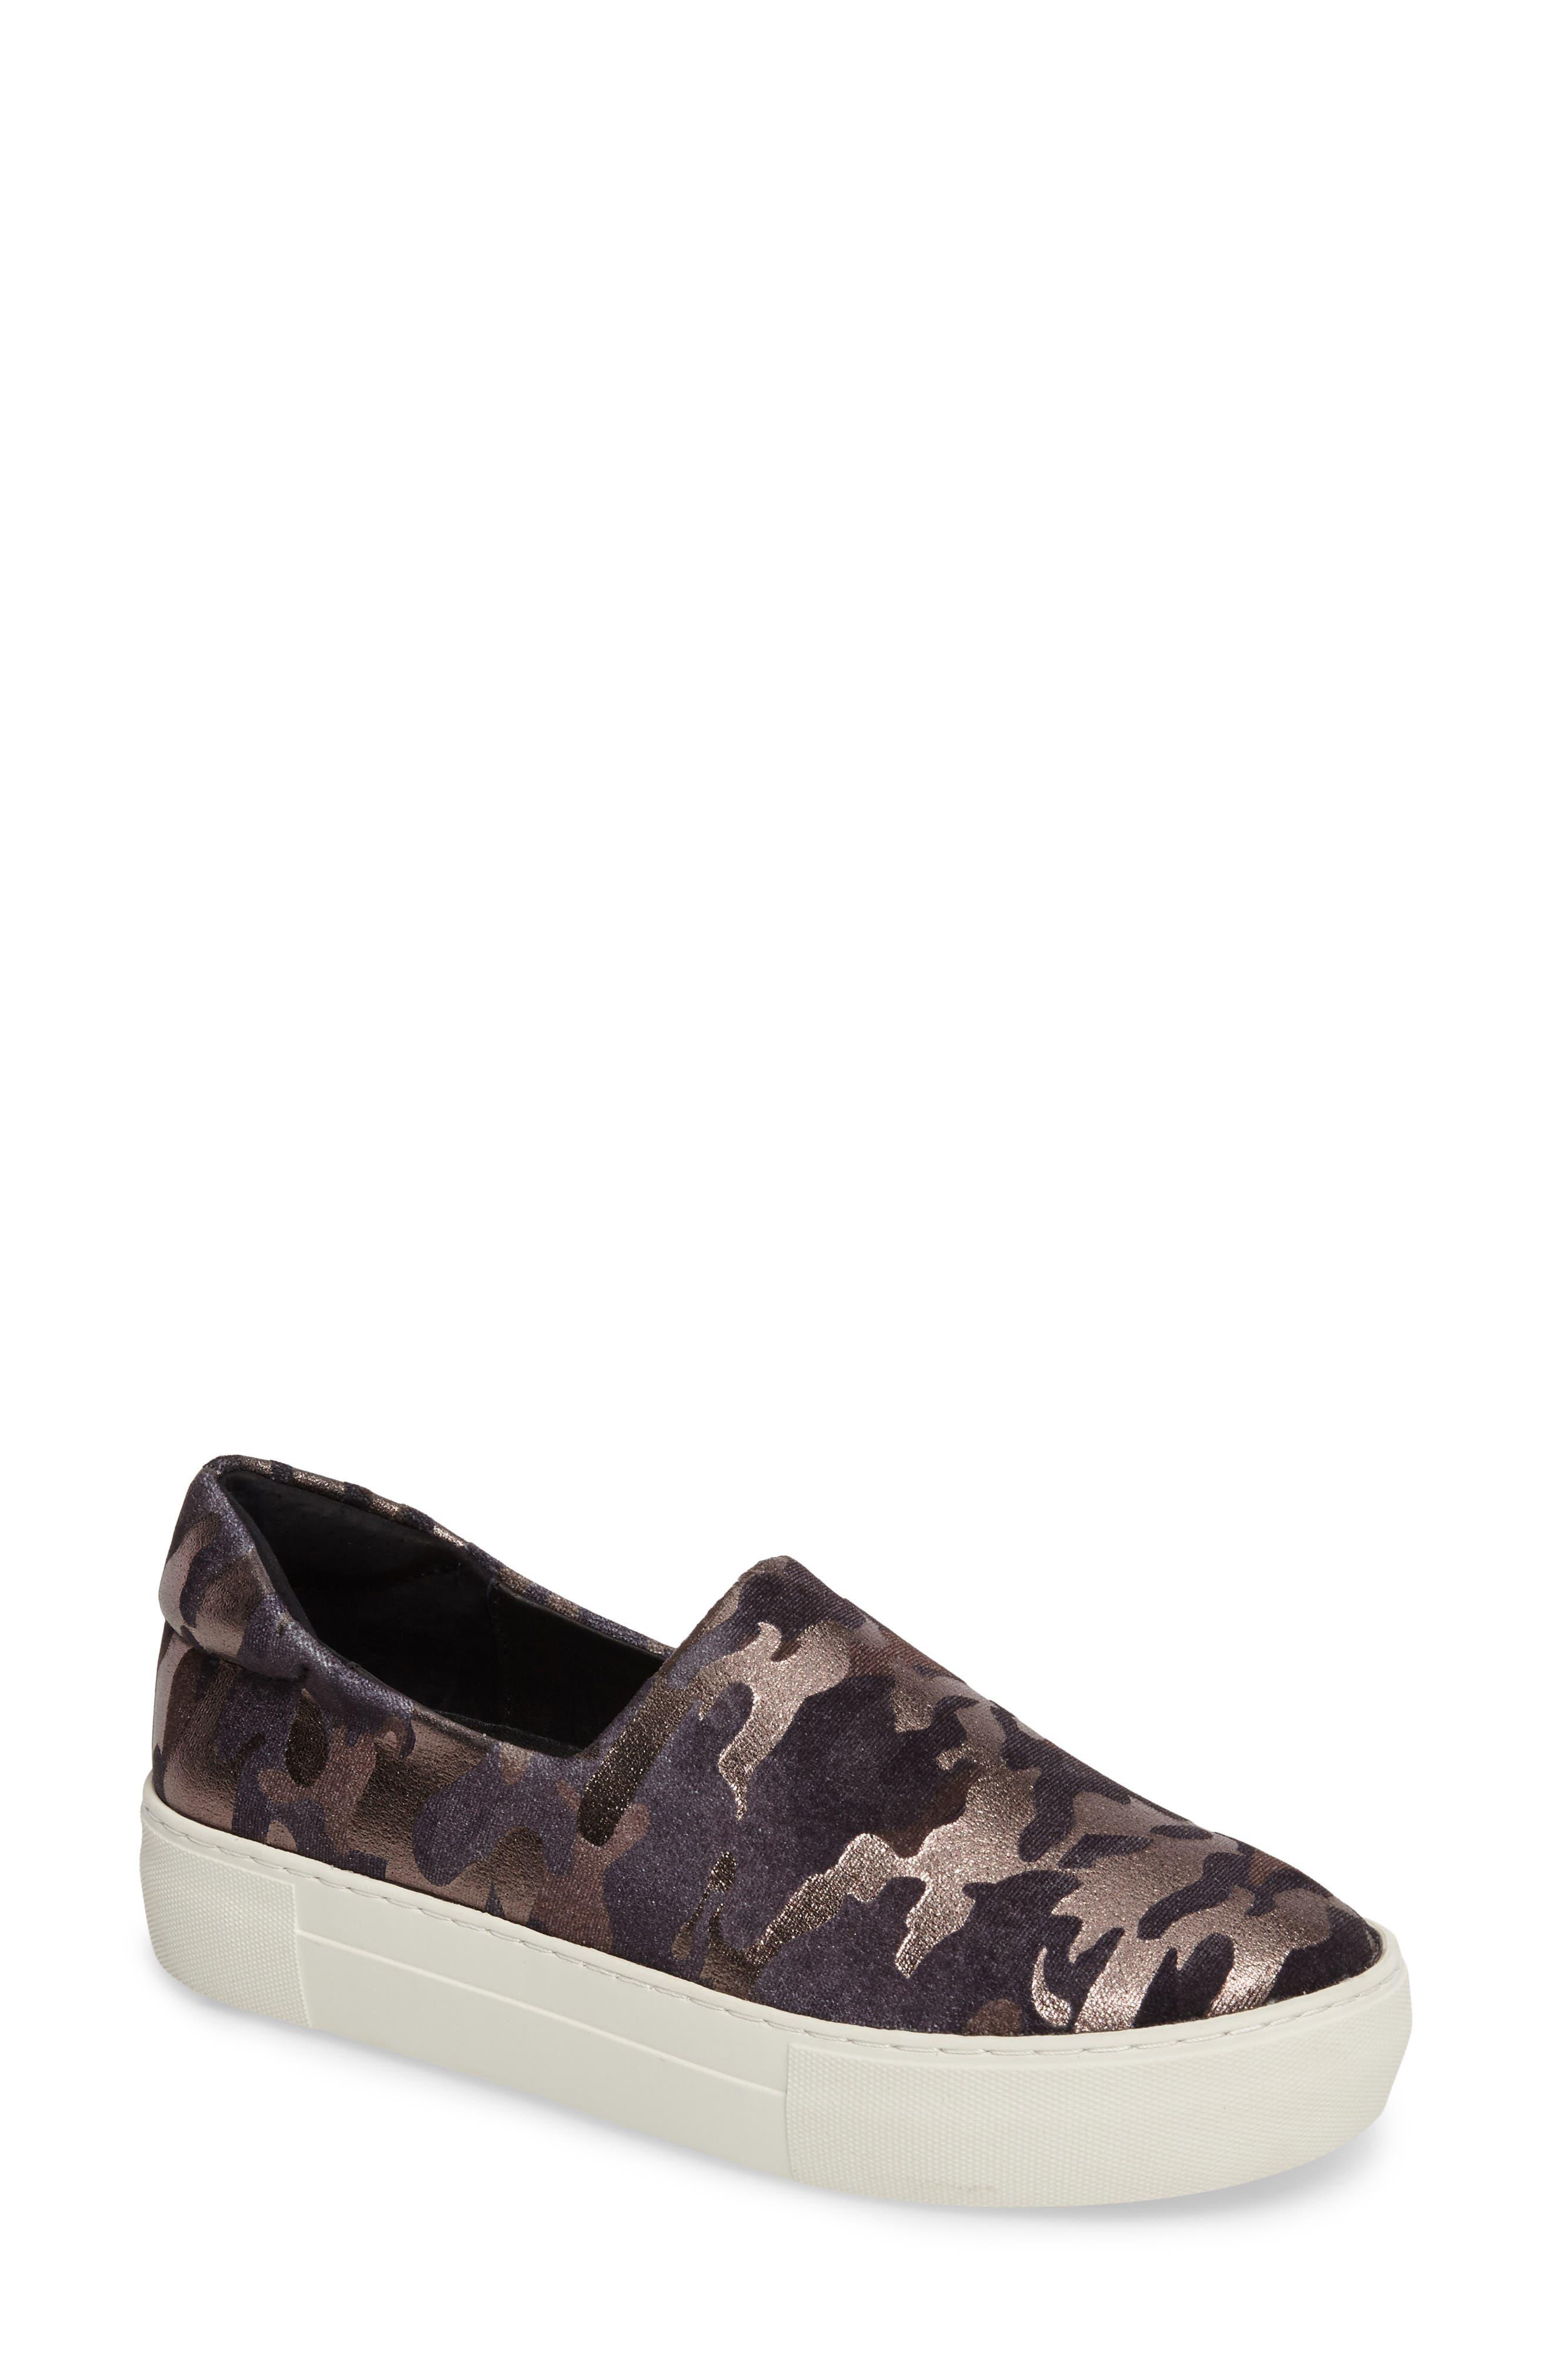 JSLIDES,                             'Ariana' Platform Sneaker,                             Main thumbnail 1, color,                             001